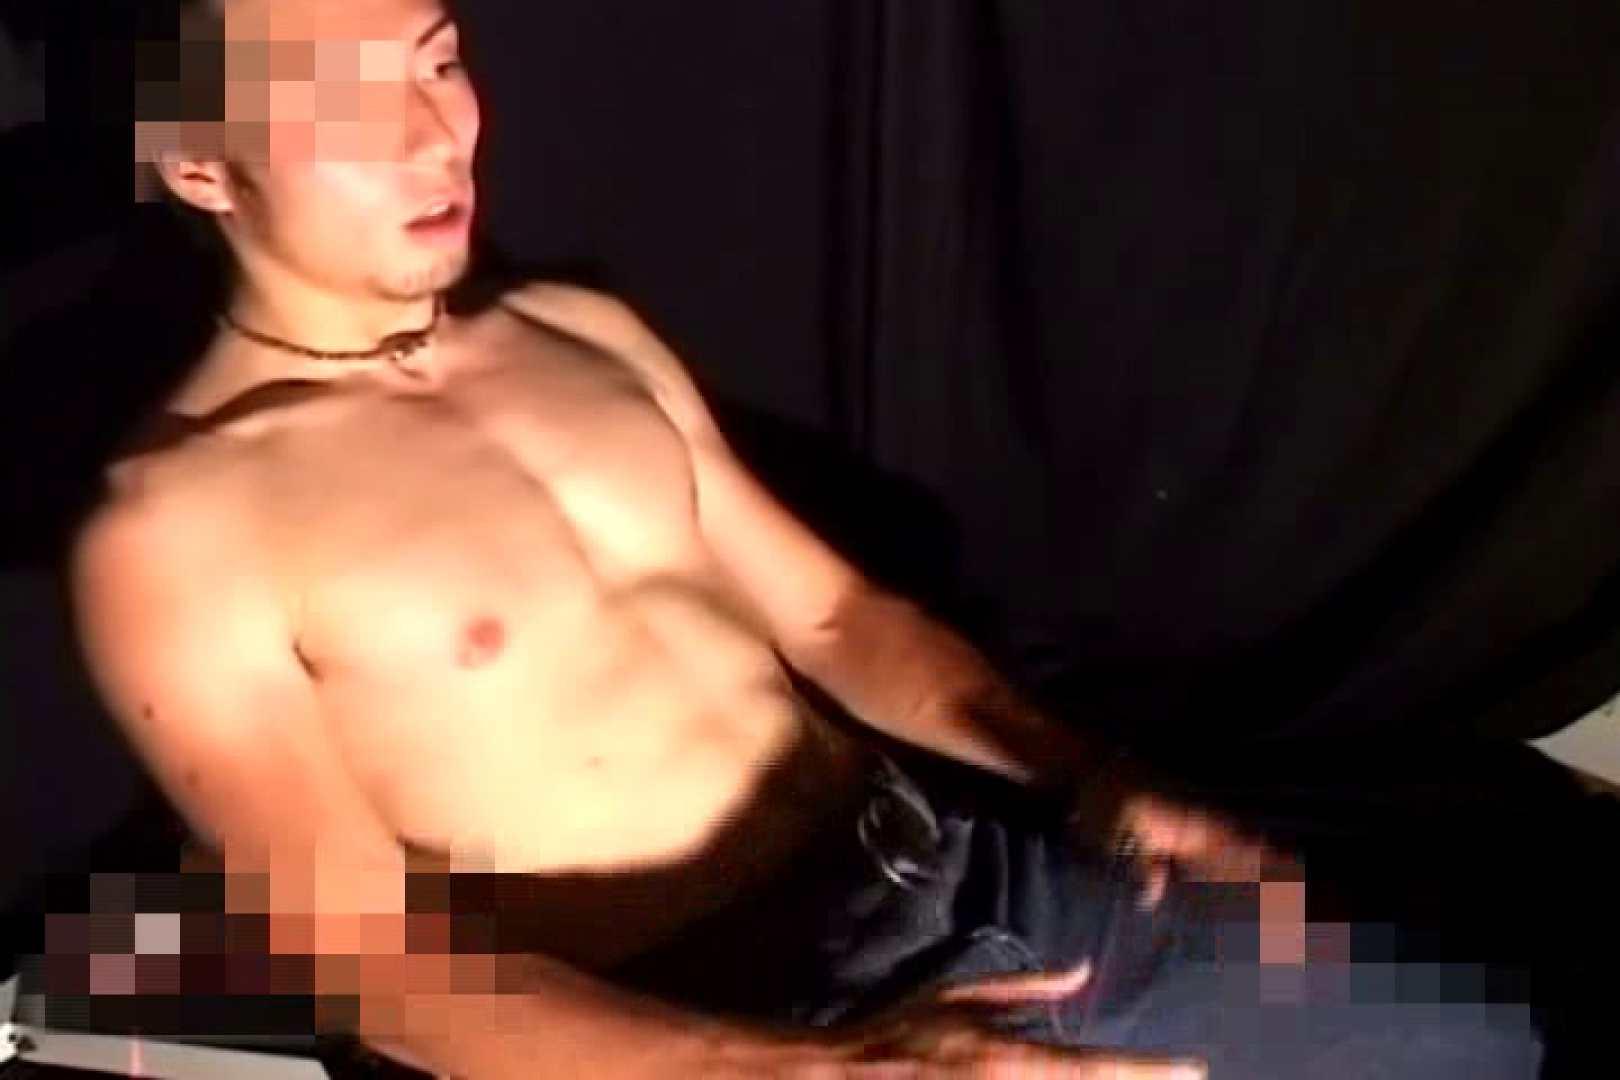 Beautiful muscle モッコリ野郎達!Vol.04 フェラDE絶頂 | イケメンのsex  103pic 29